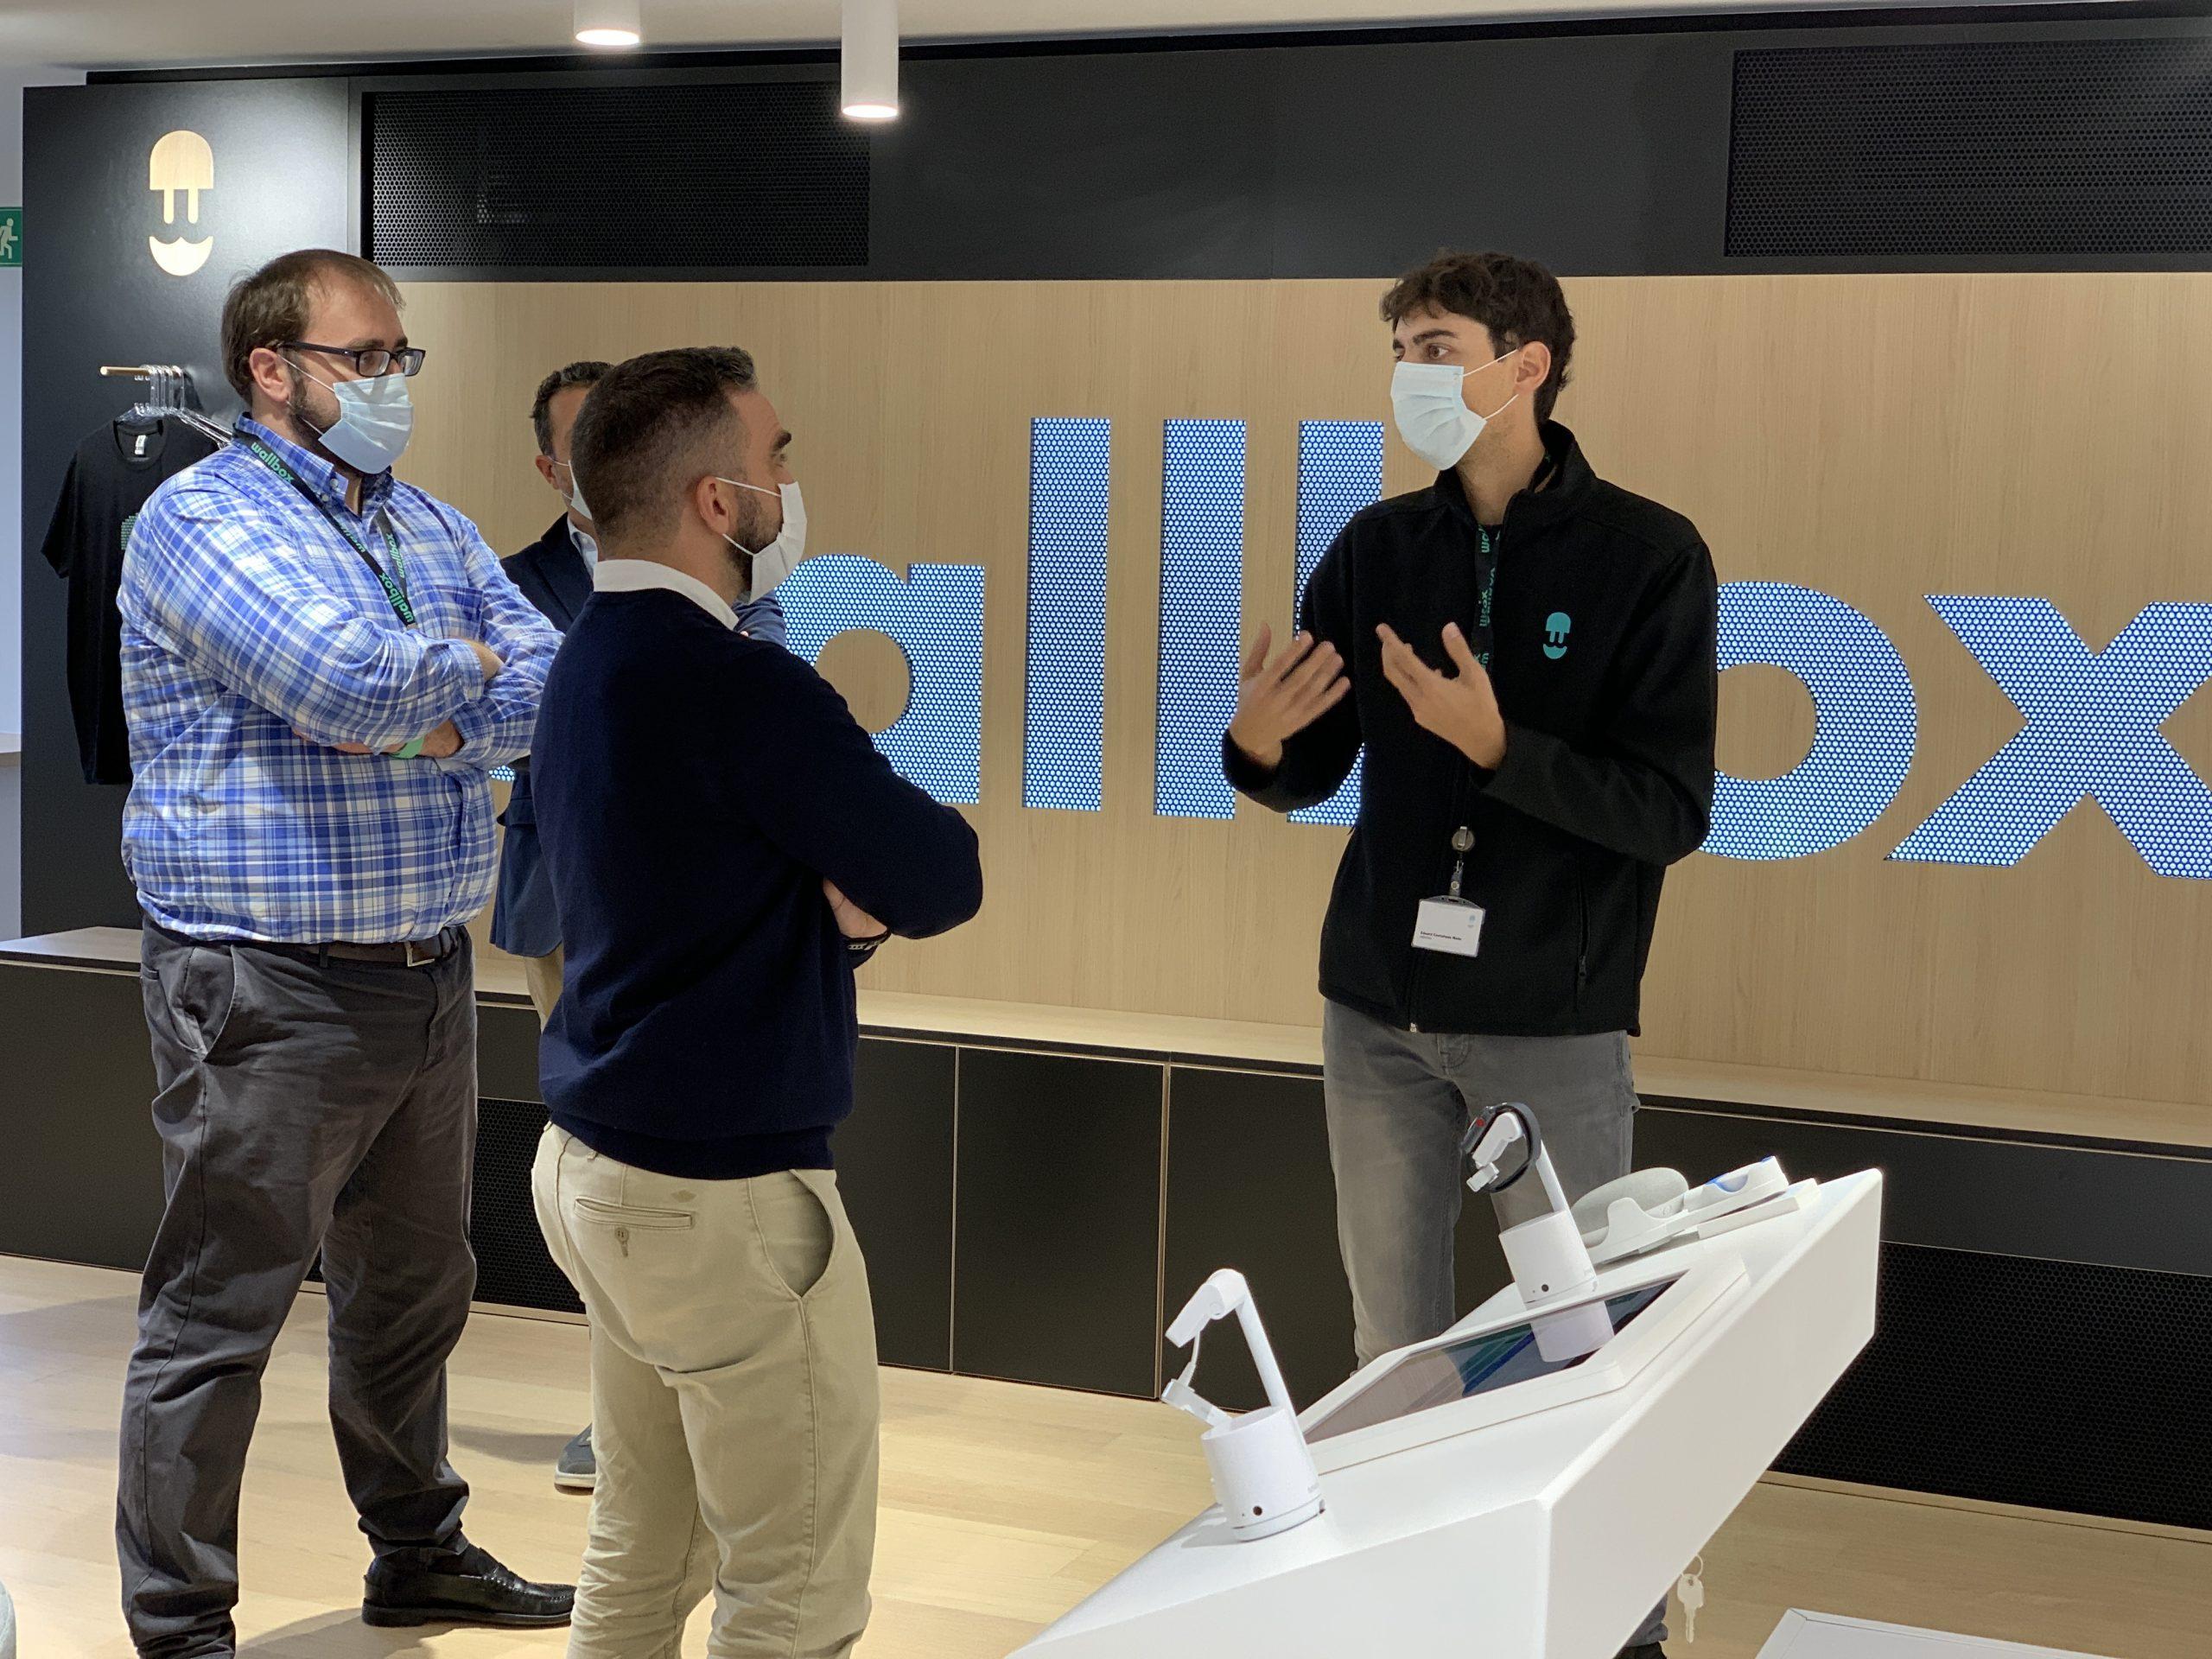 Wallbox receives the visit of Francisco Polo, High Commissioner for Spain's entrepreneurship and innovation program España Nación Emprendedora